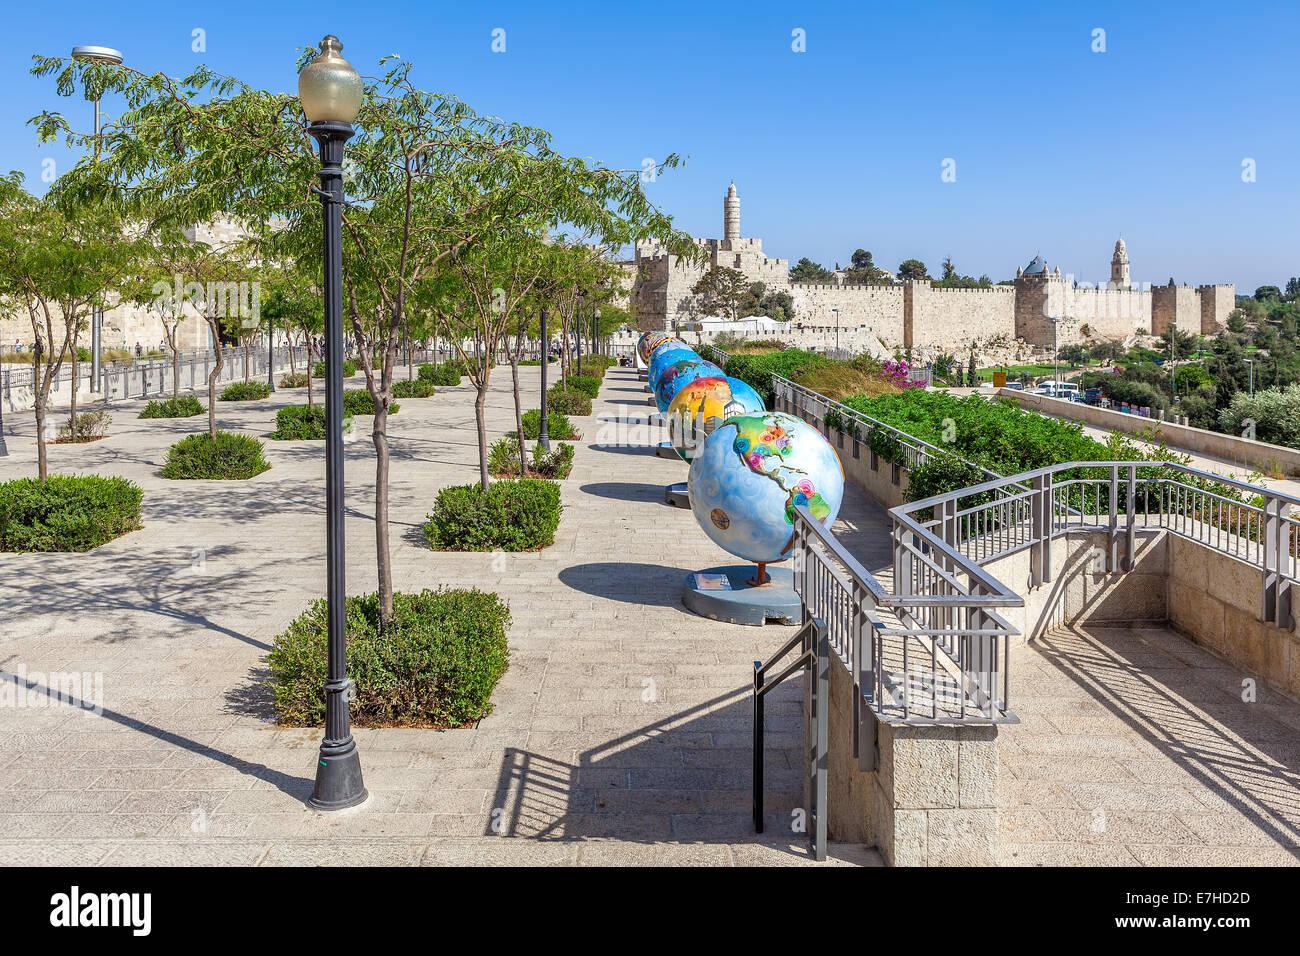 Globes esposizione nella Città Vecchia di Gerusalemme, Israele. Immagini Stock